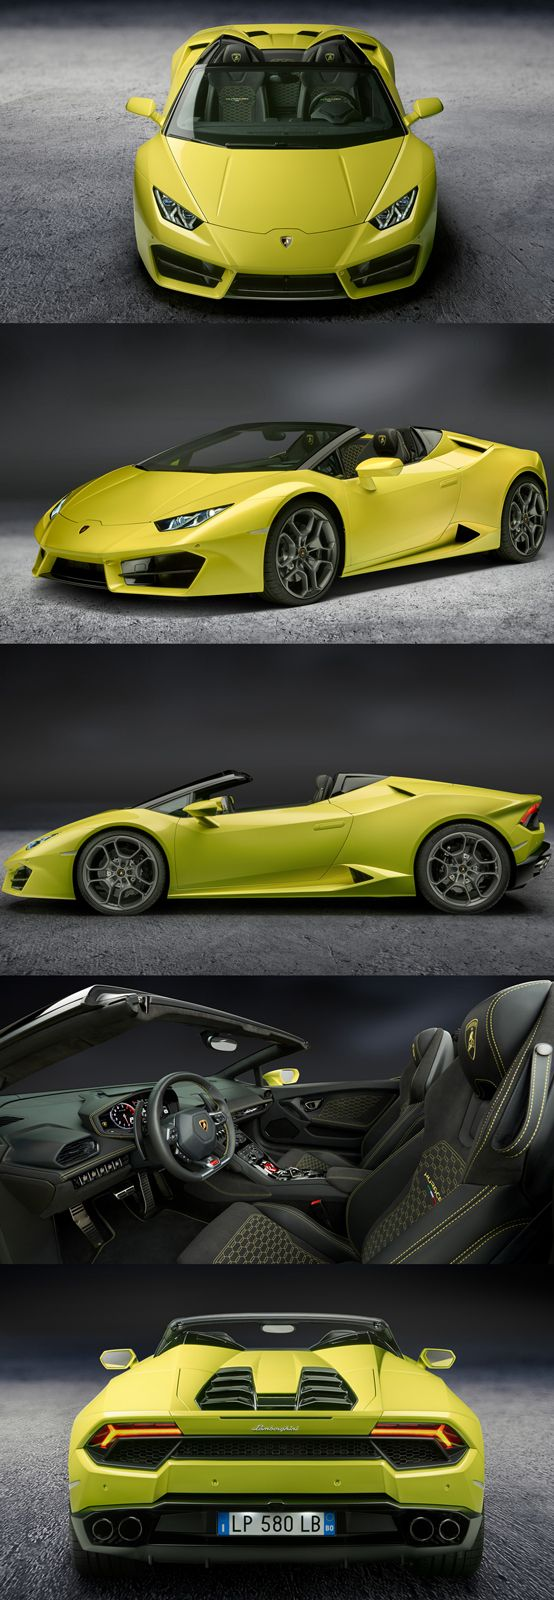 Breaking News Lamborghini Reveals Its New Huracan Rear Wheel Drive Spyder Lamborghini Huracan Coches Deportivos Autos Deportivos